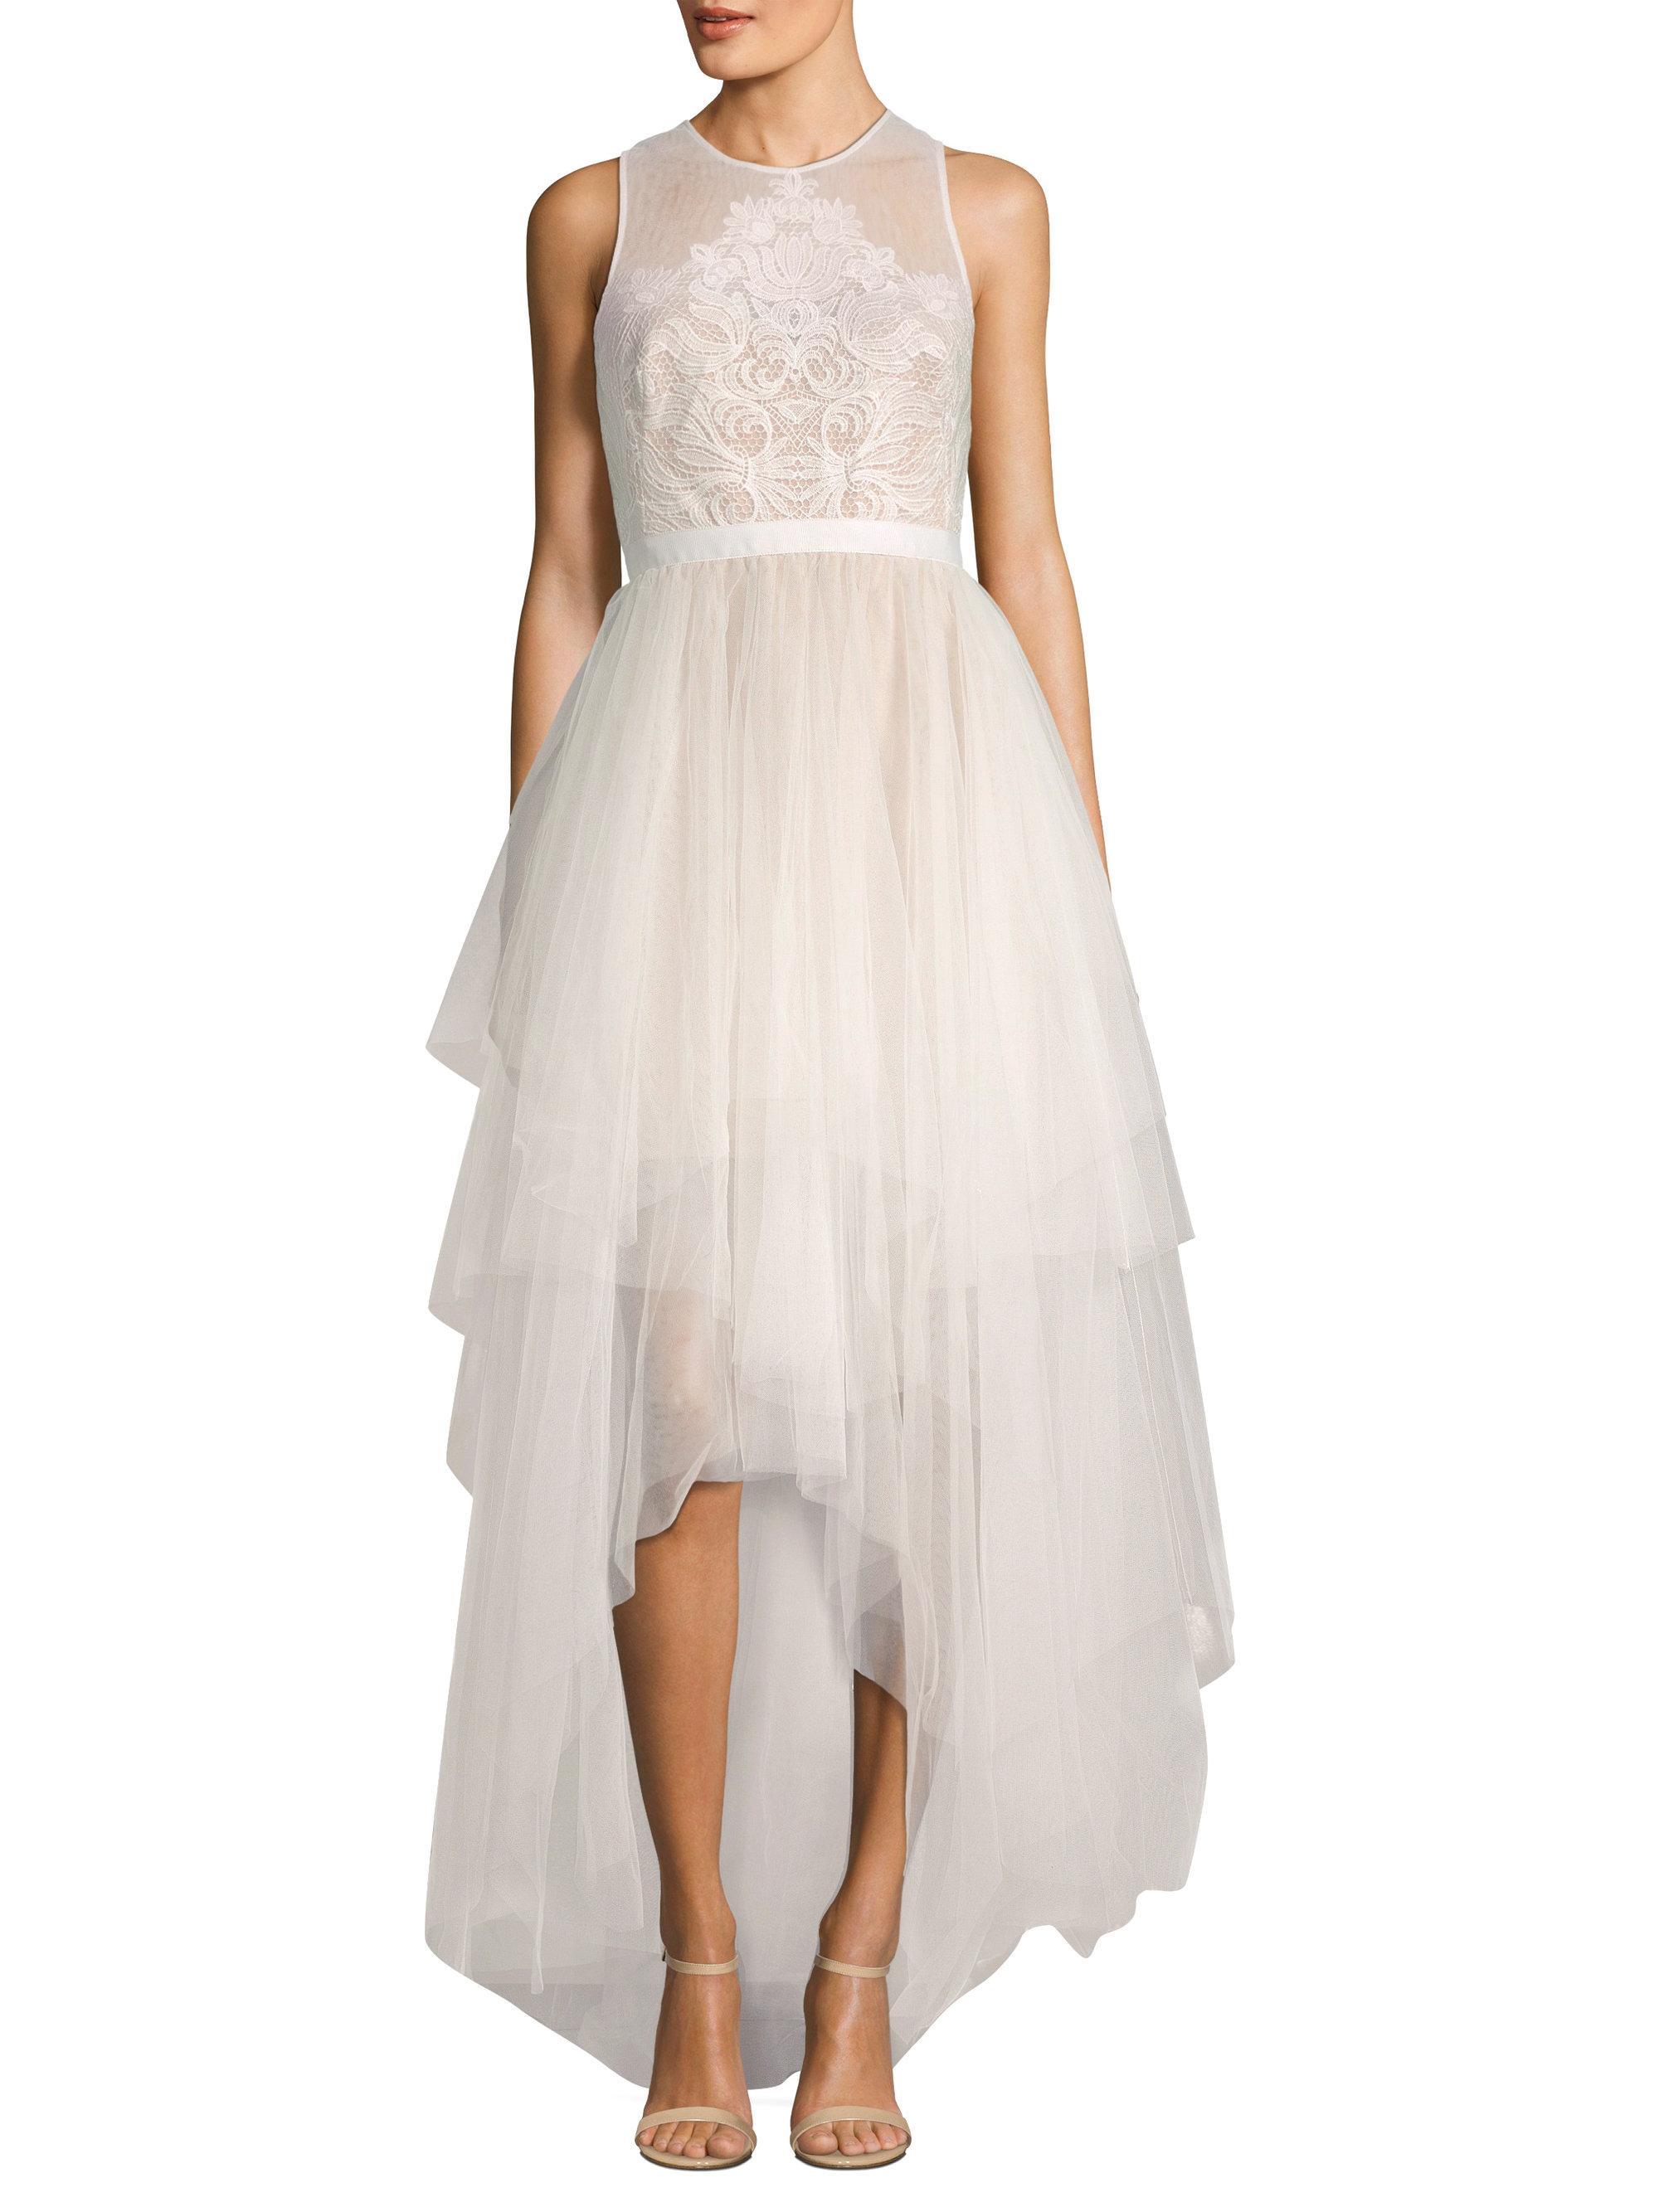 f3faad46a6f Bcbg High Low Dress White - Photo Dress Wallpaper HD AOrg